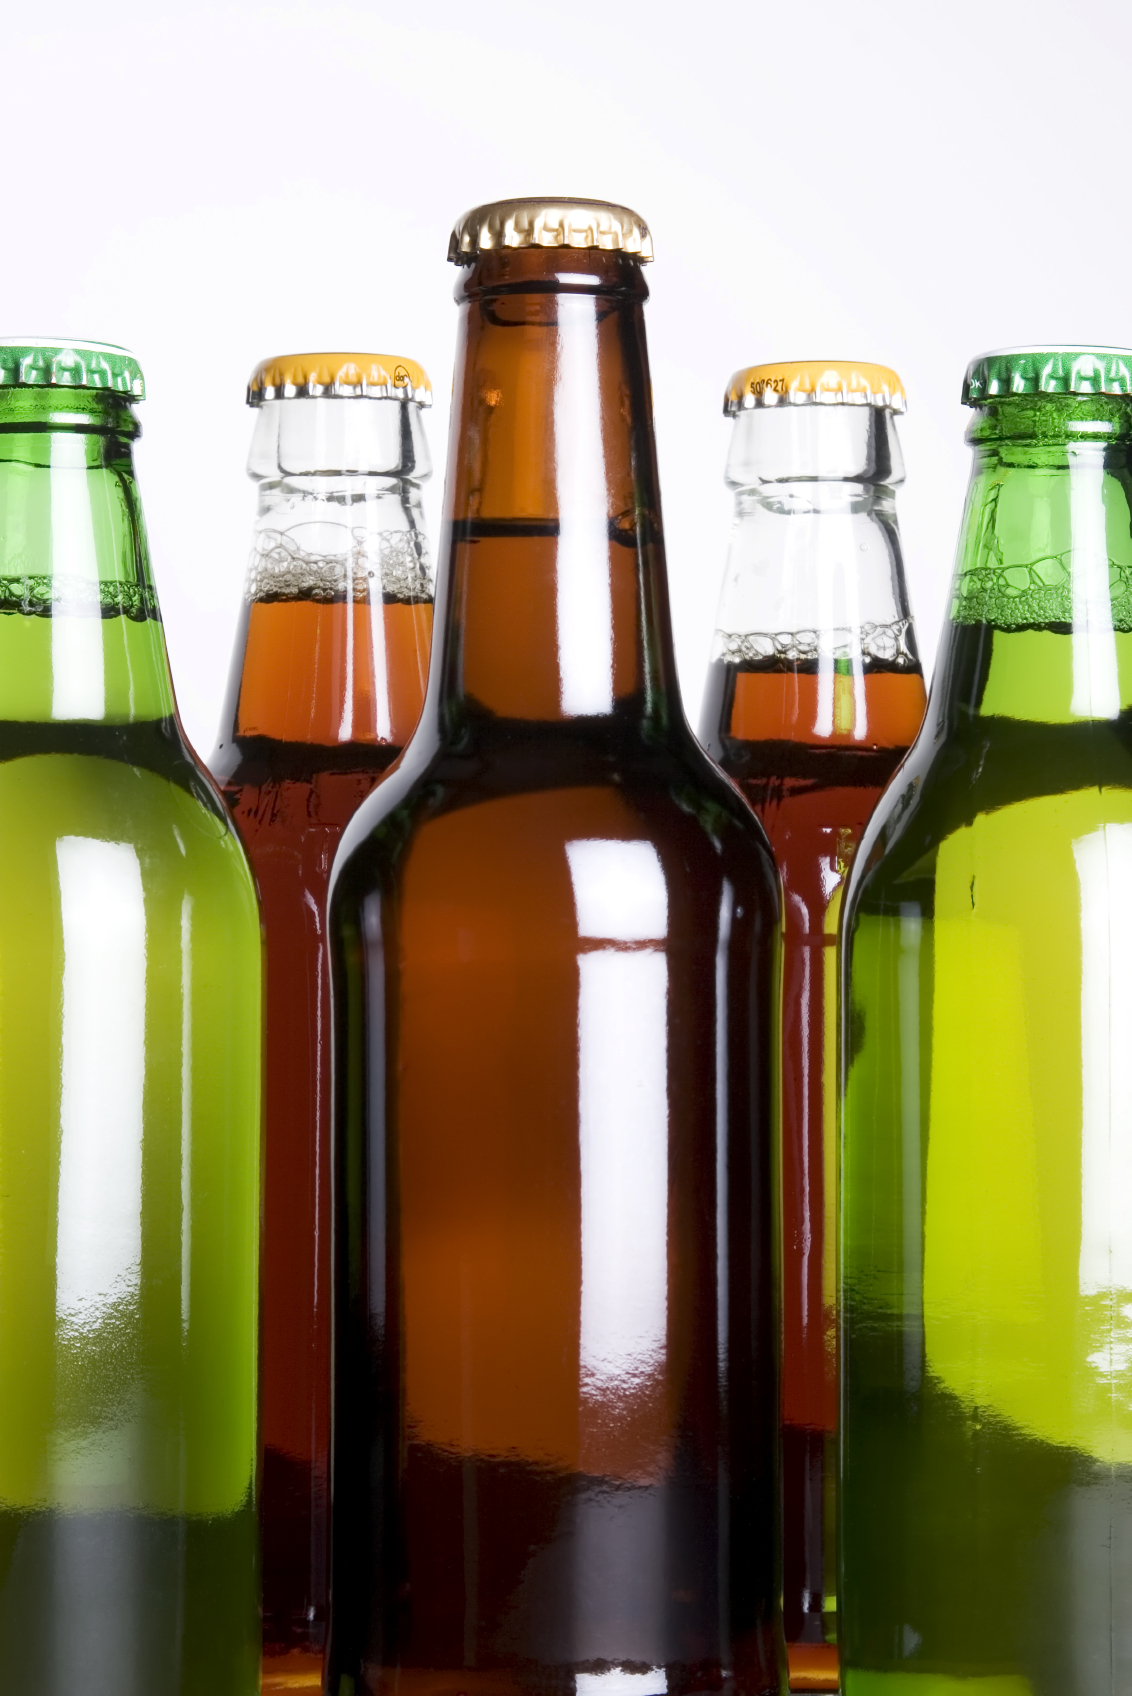 stock-photo-1944498-bottles-of-beer.jpg